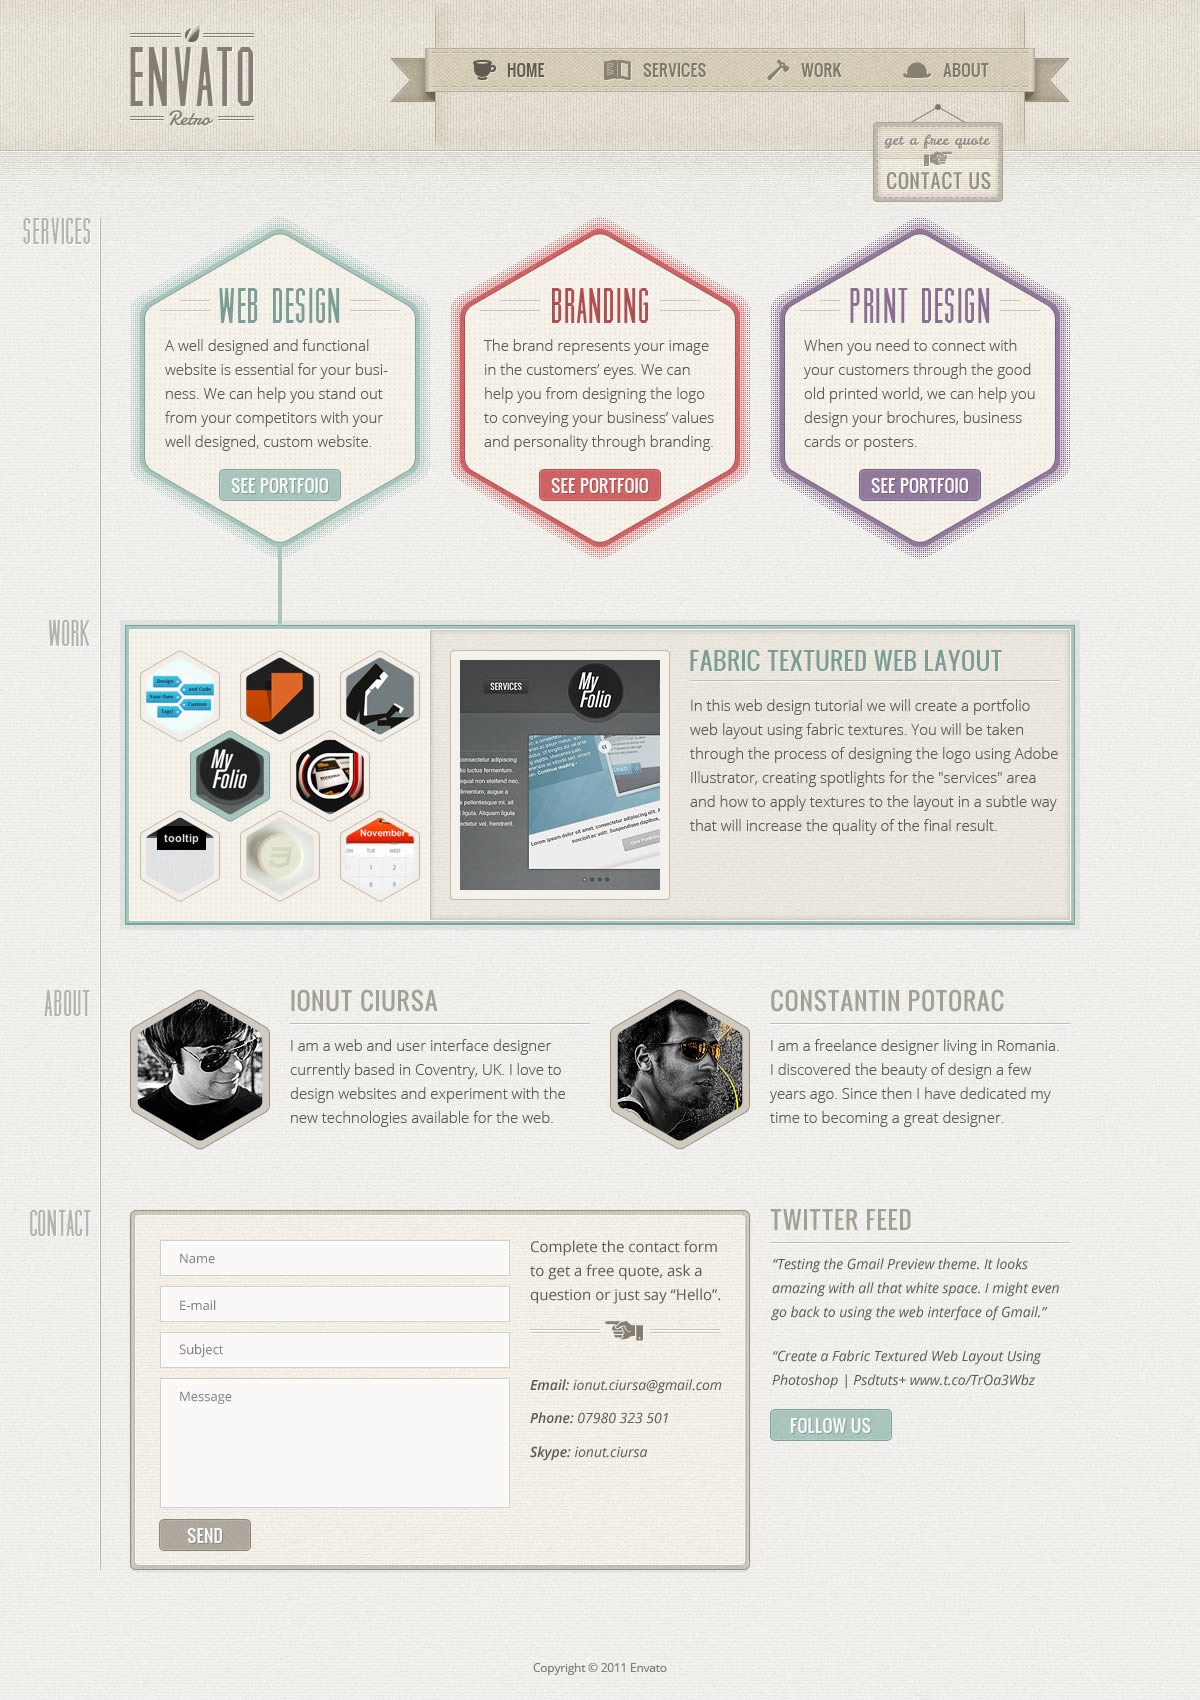 20 amazing photoshop web design tutorials creative splash web agency.